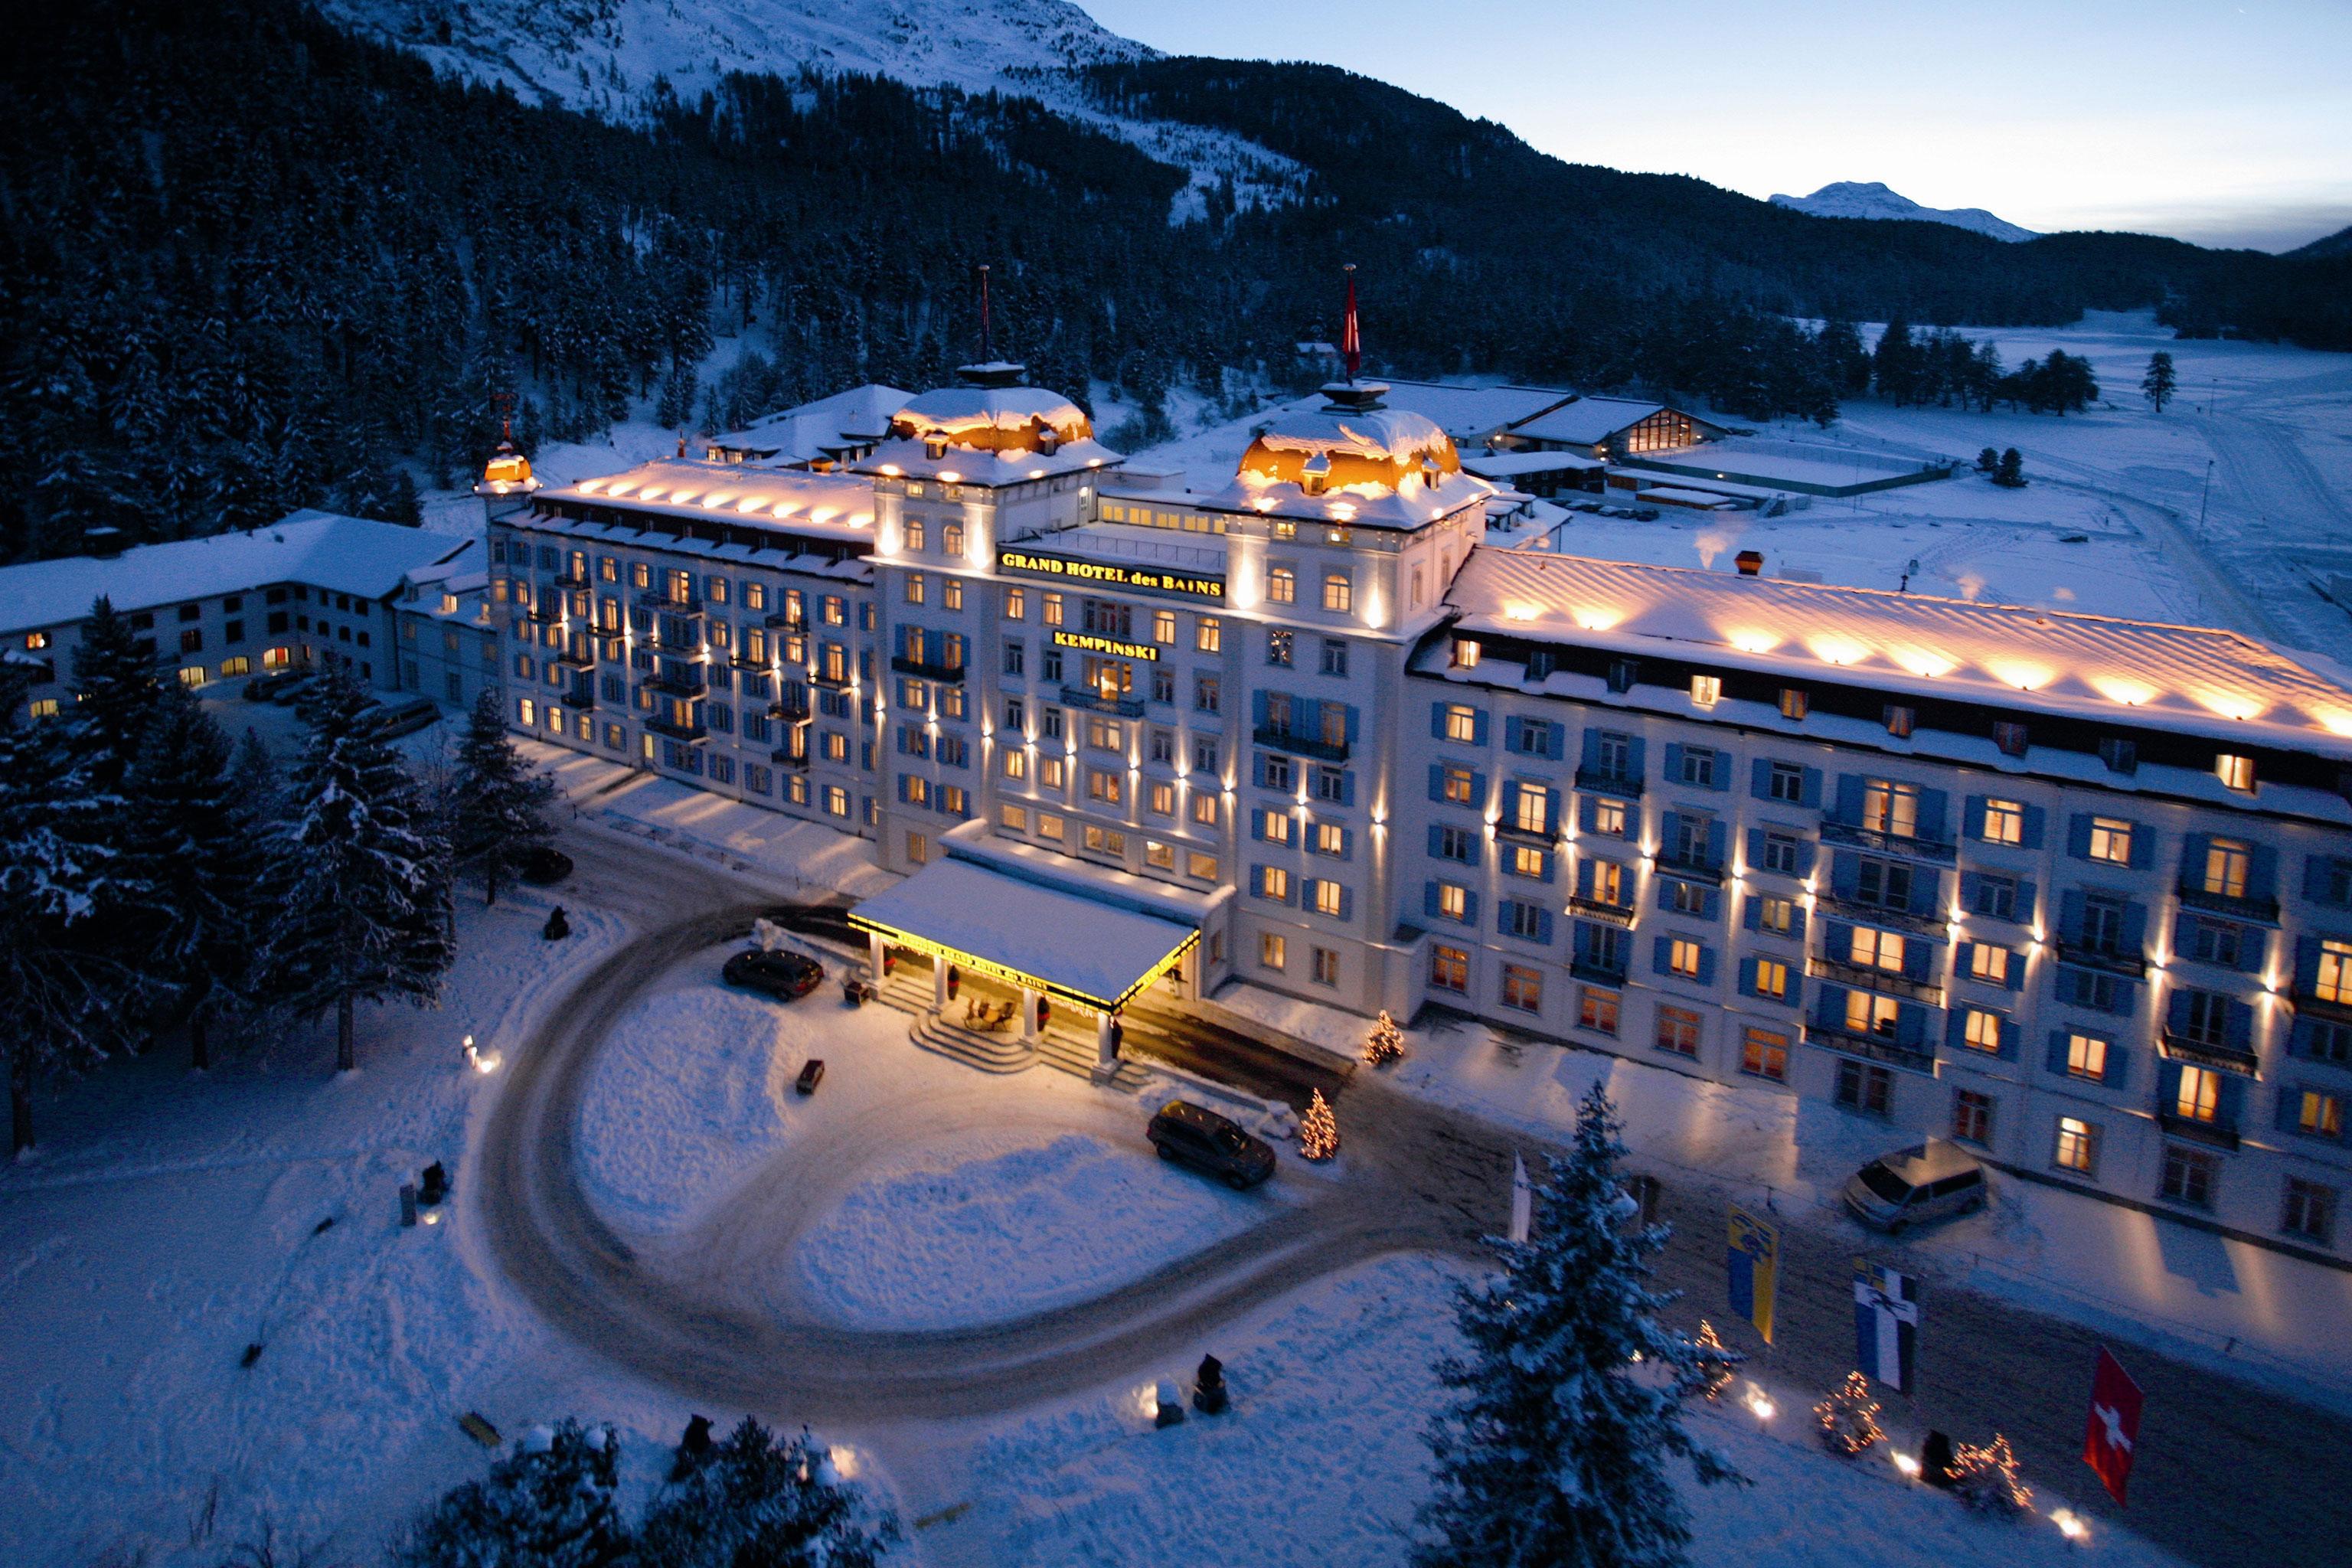 a9e14c262a4e66 Kempinski Residences St. Moritz - OFFICIAL SITE - Luxury Holiday Residences  Switzerland - Kempinski Residences St. Moritz